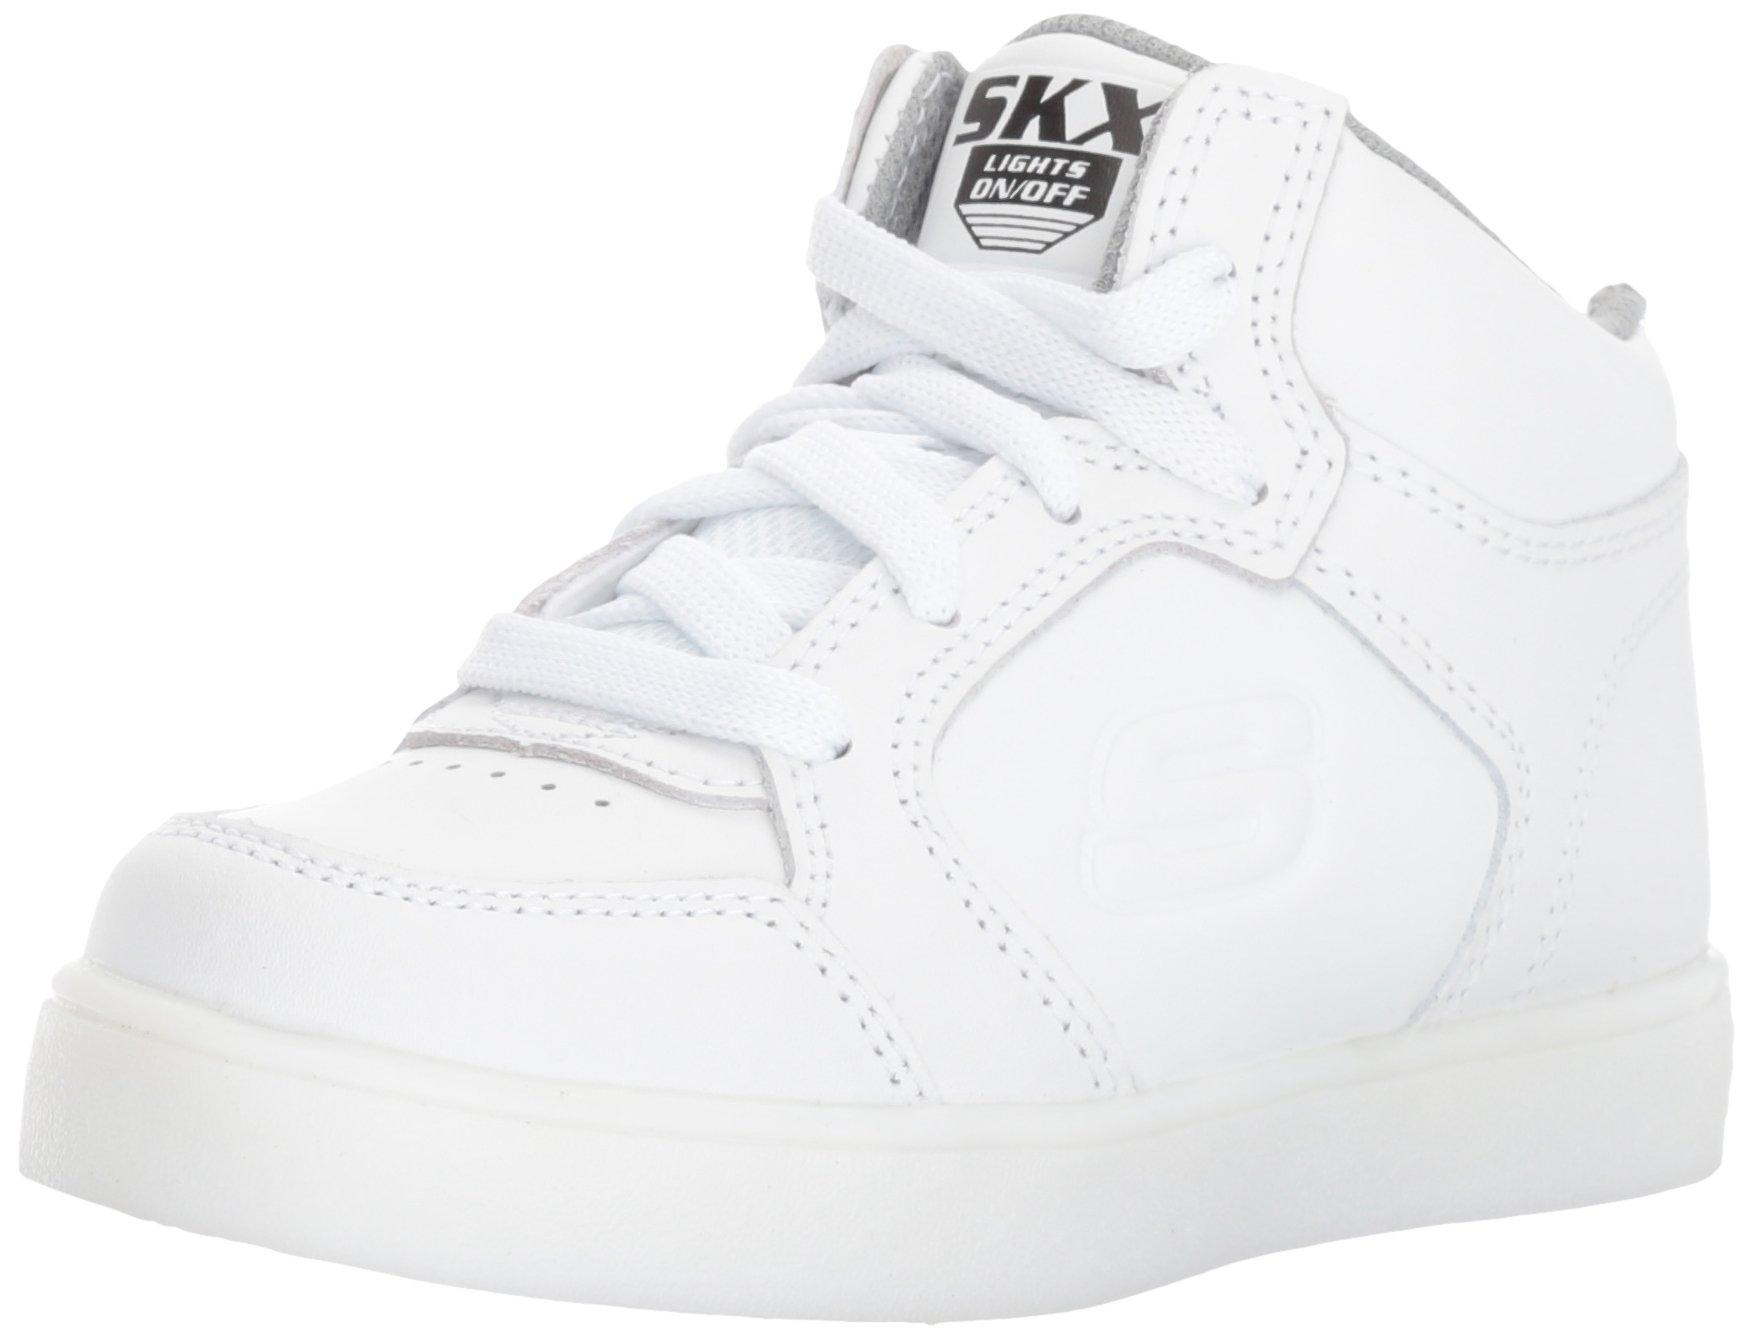 Skechers Kids Boys Energy Lights Sneaker,7 M US Big Kid,White